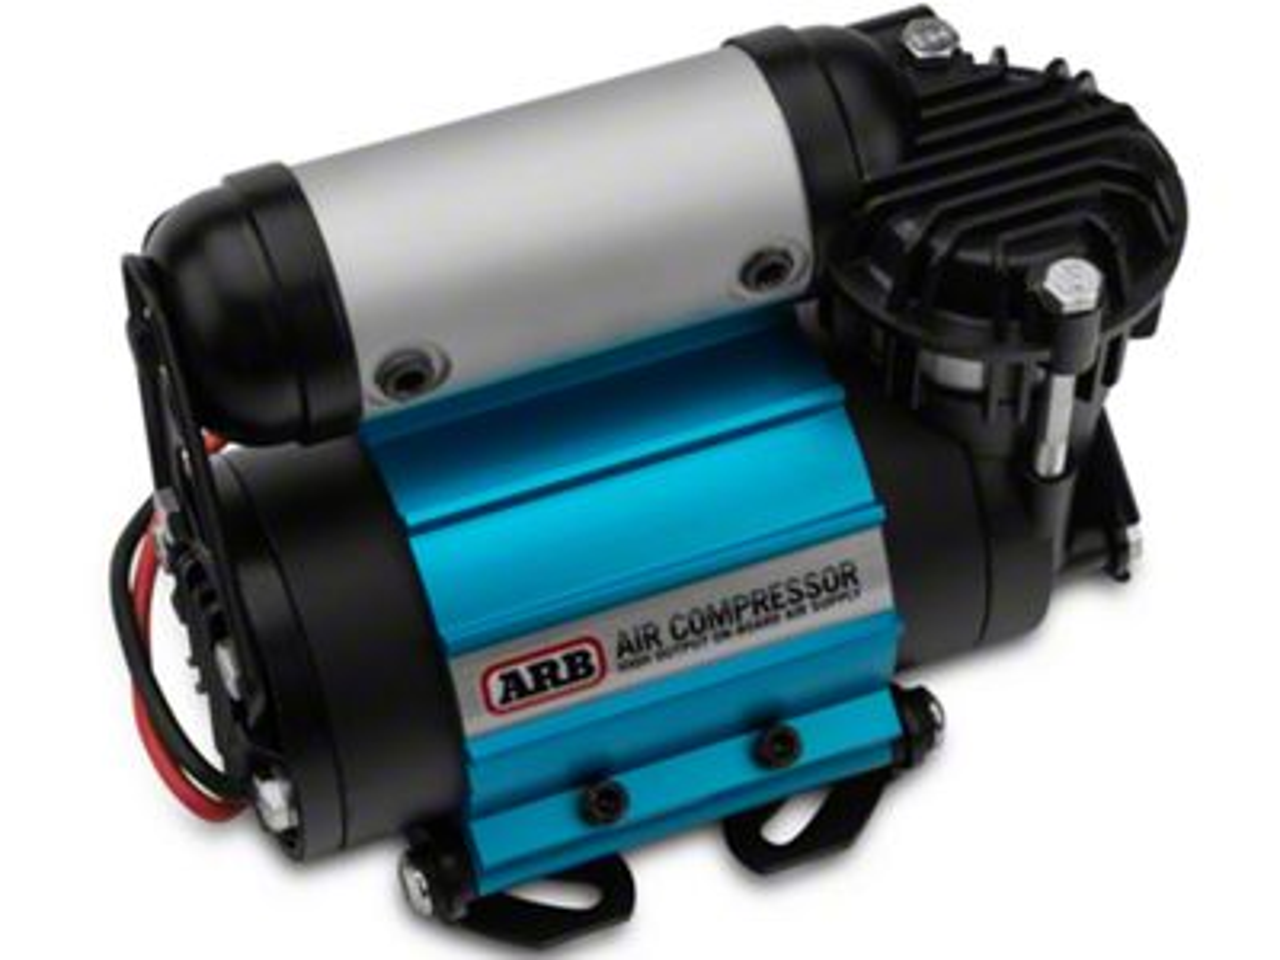 Add ARB High Output Air Compressor (87-17 Wrangler YJ, TJ, & JK)